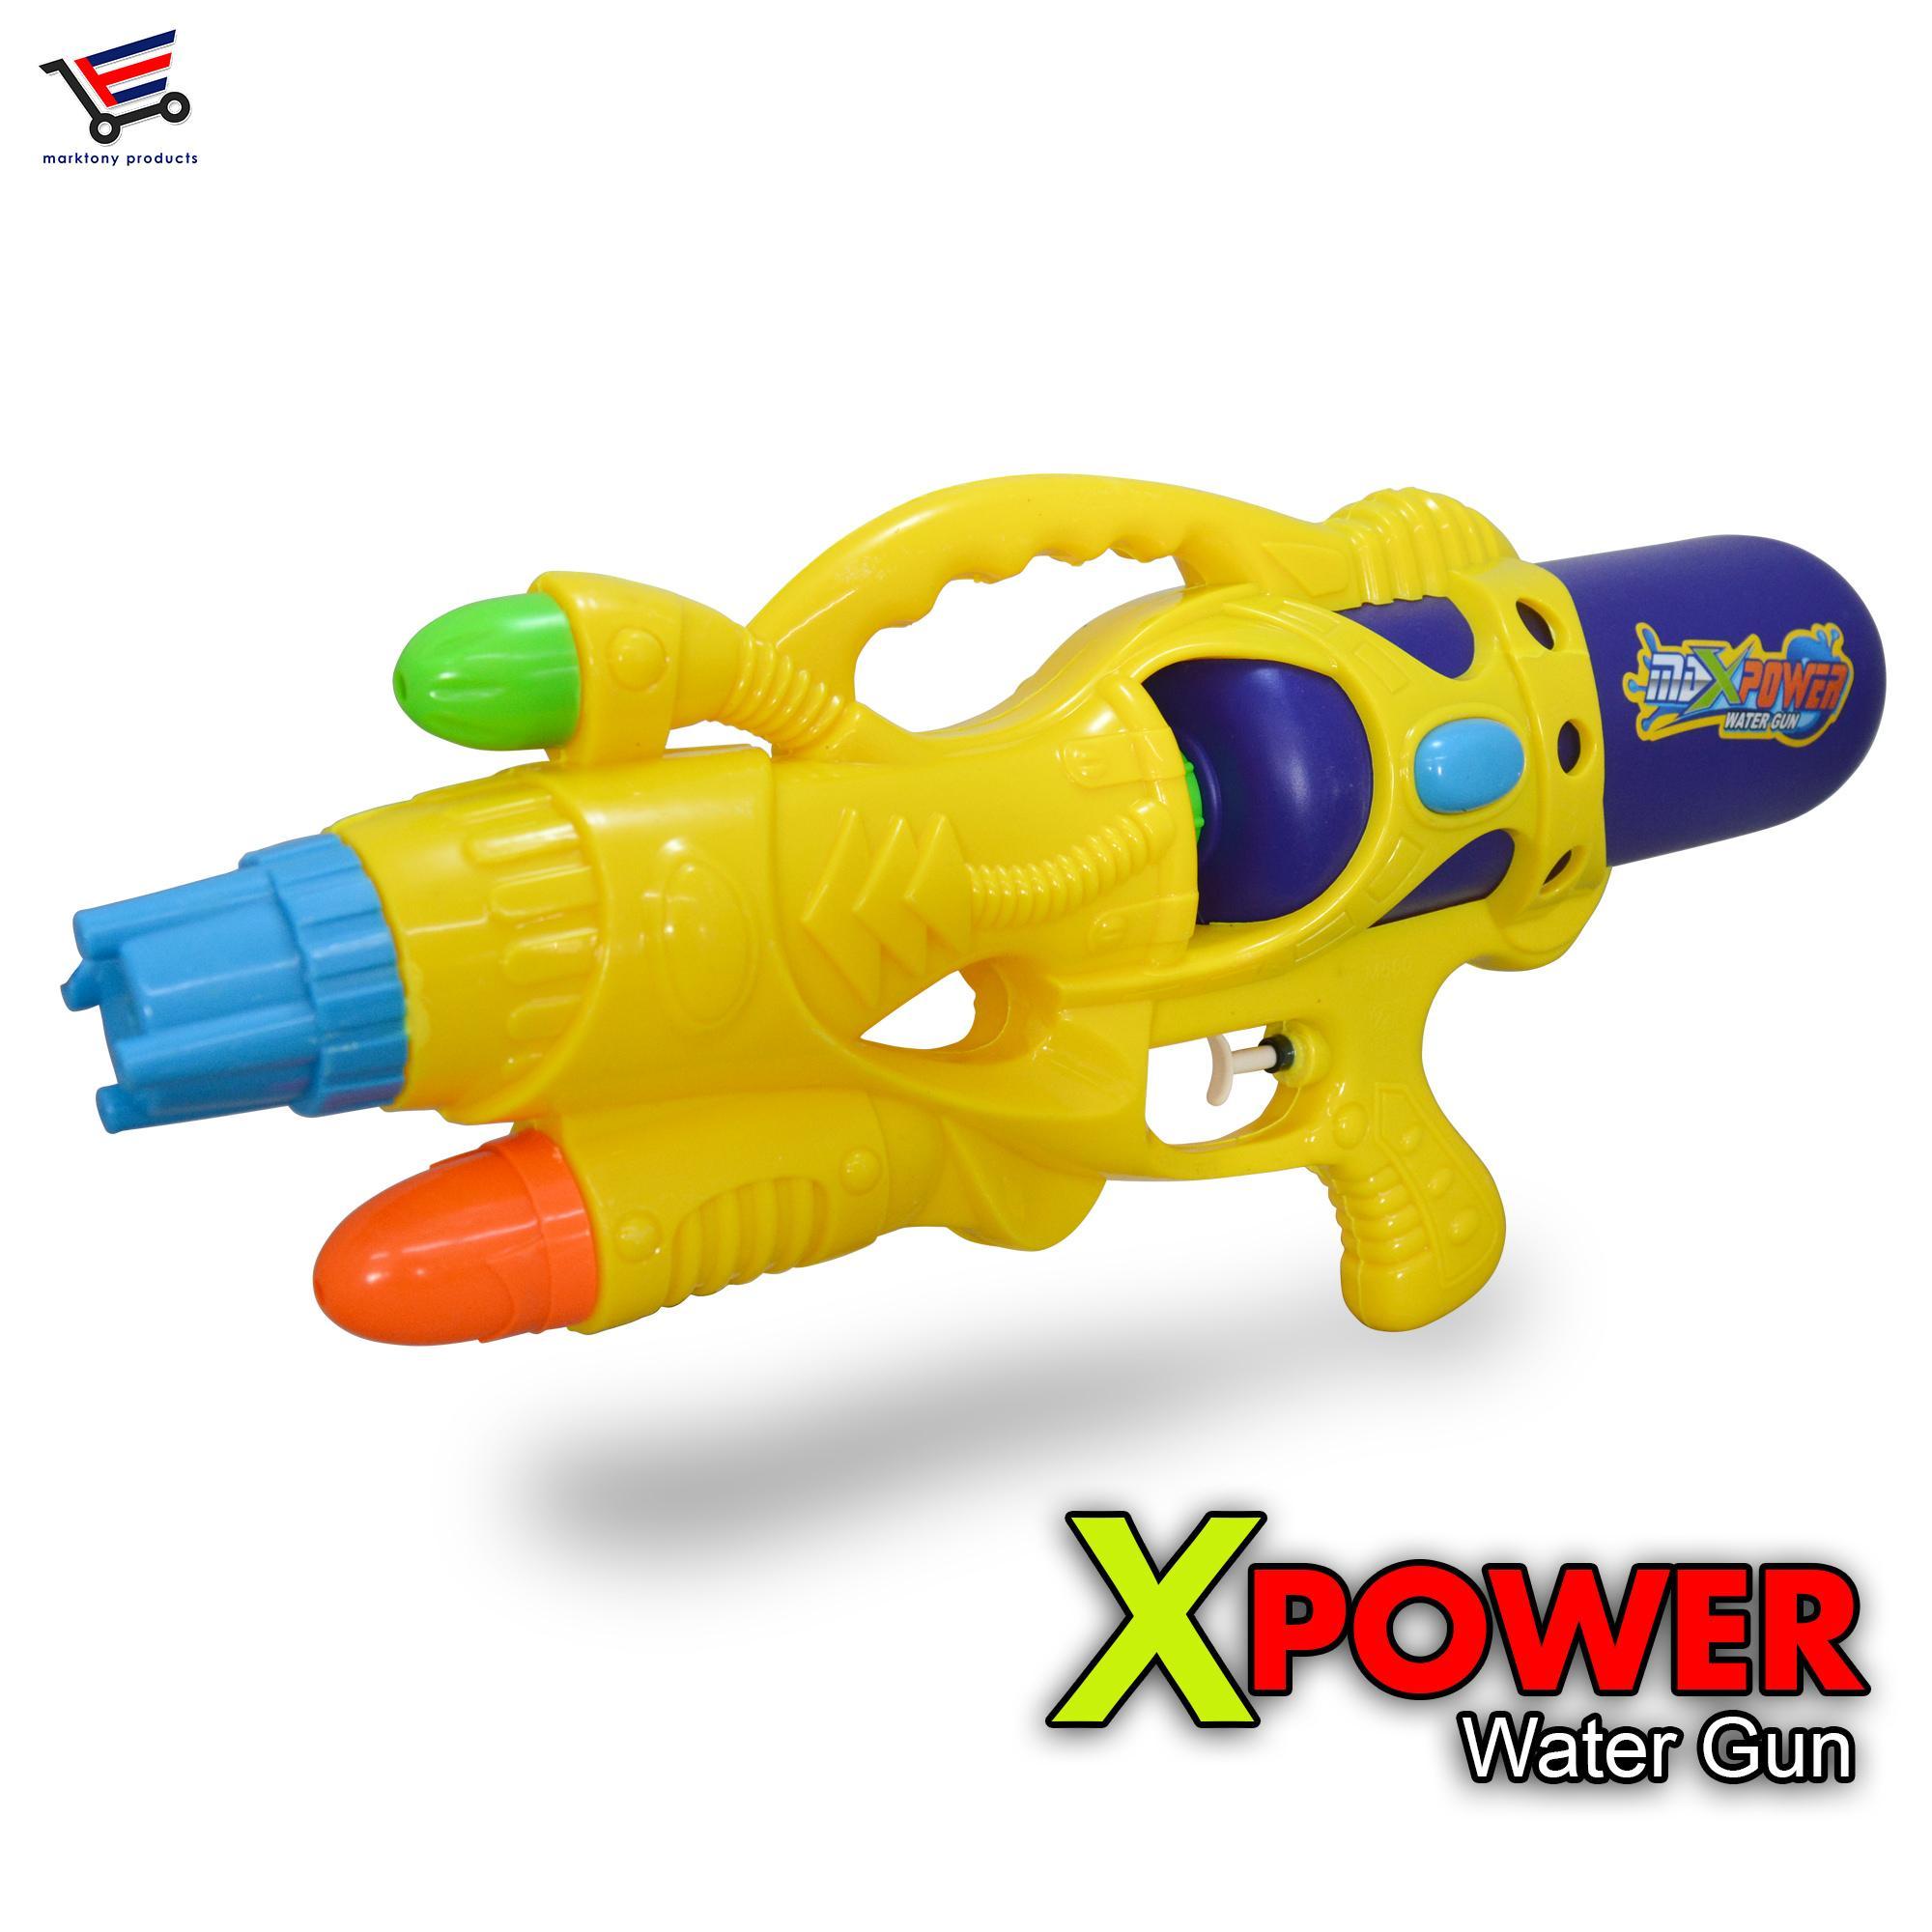 Xpower Far Range Water Gun Blaster Yellow